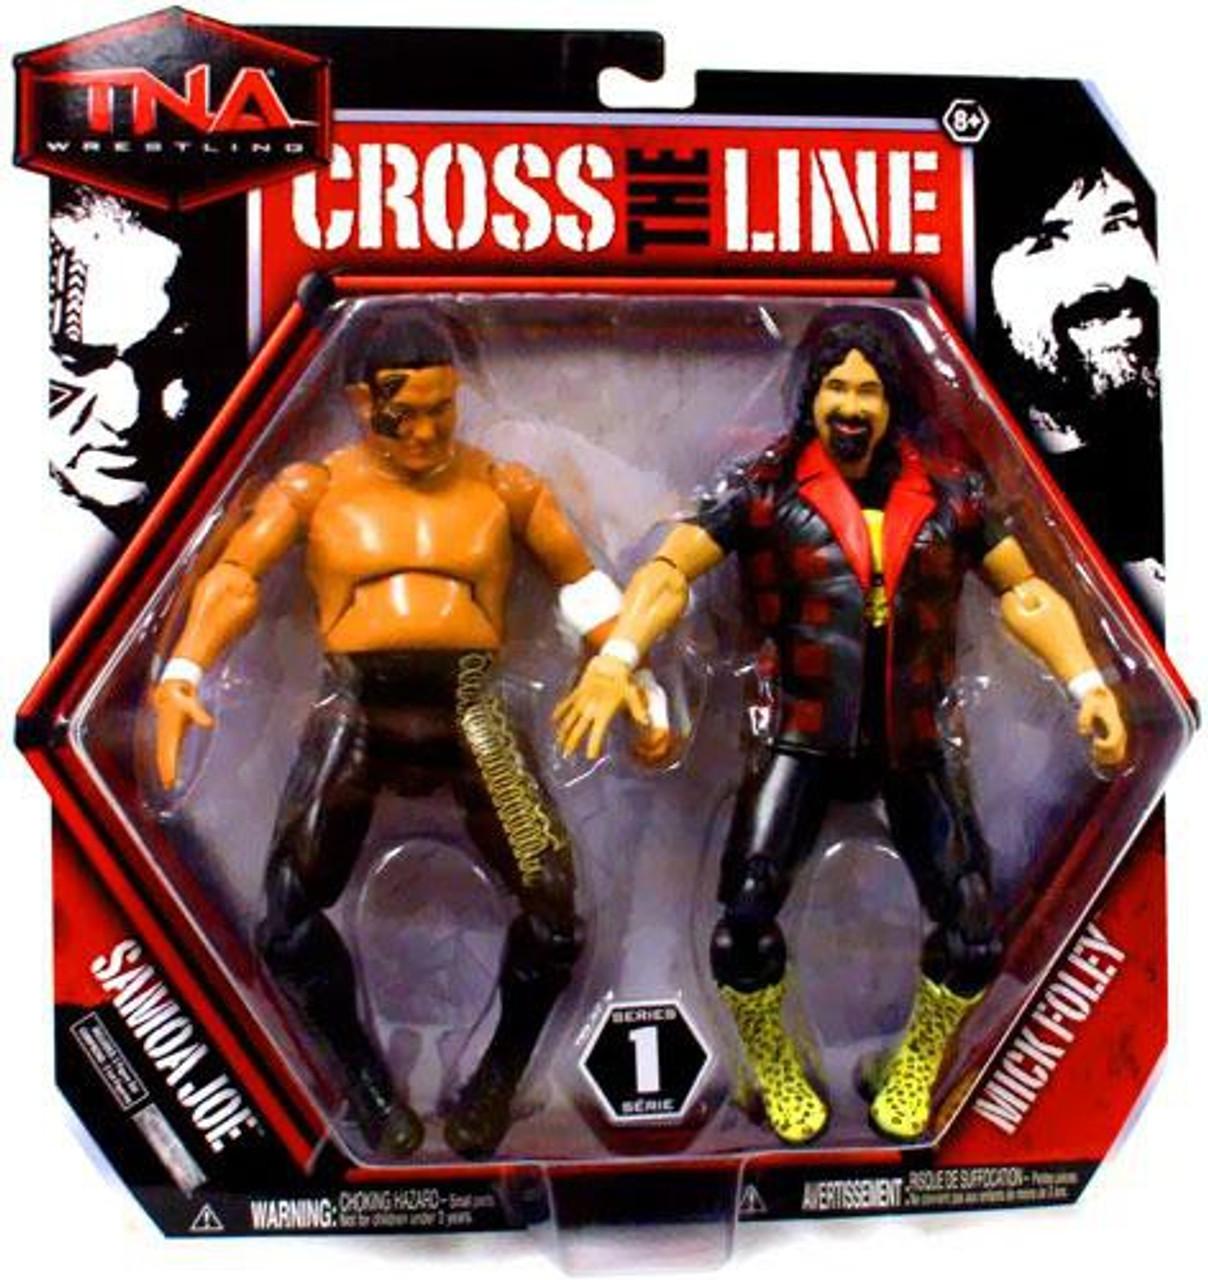 TNA Wrestling Cross the Line Series 1 Samoa Joe & Mick Foley Action Figure 2-Pack